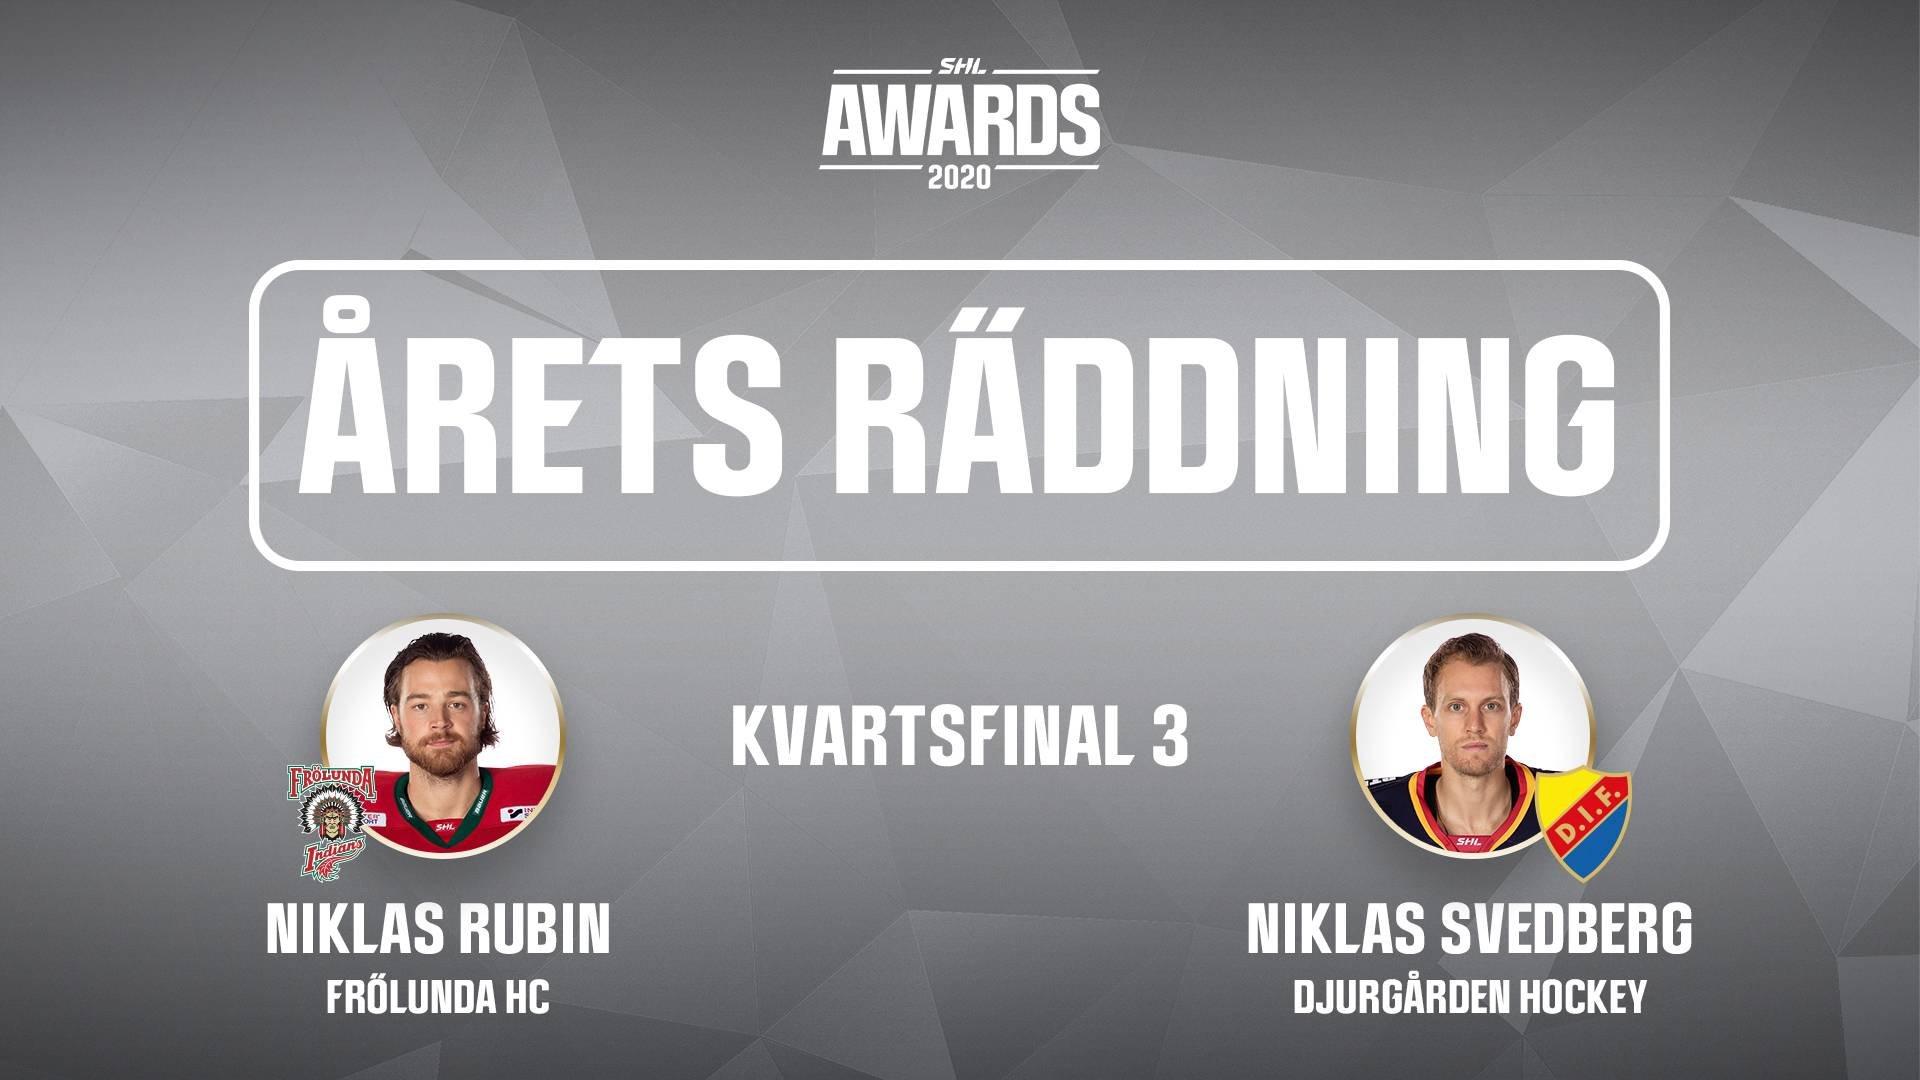 Årets räddning 2019/2020 - Kvartsfinal 3